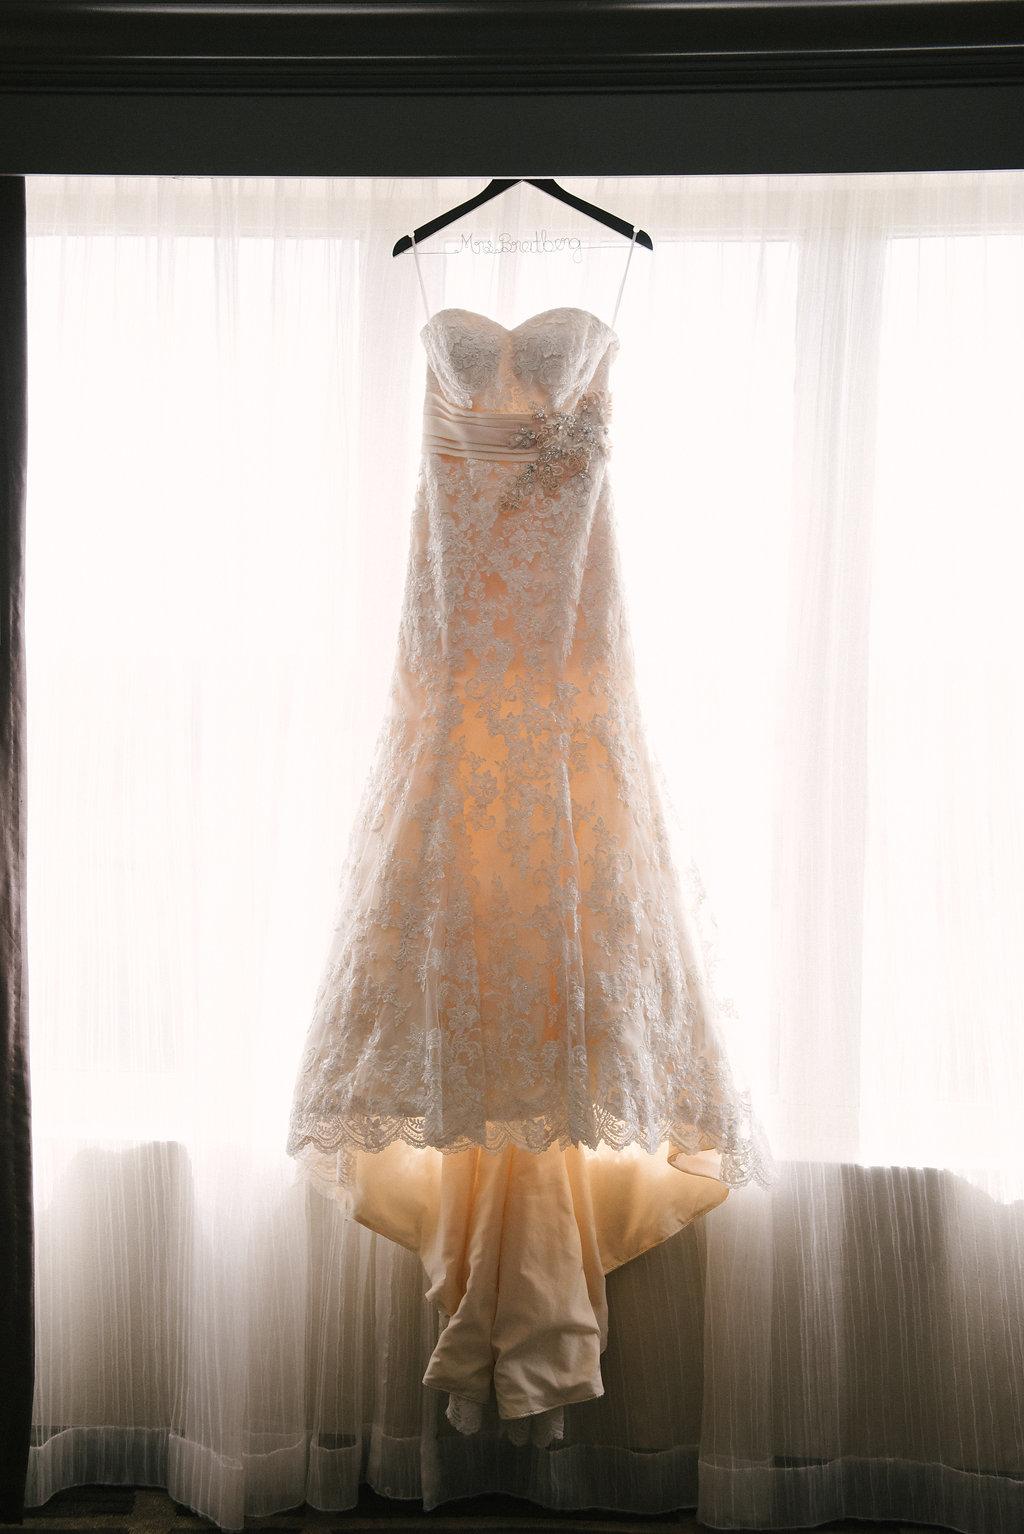 Strapless Lace Allure Bridal Wedding Dress on Hanger